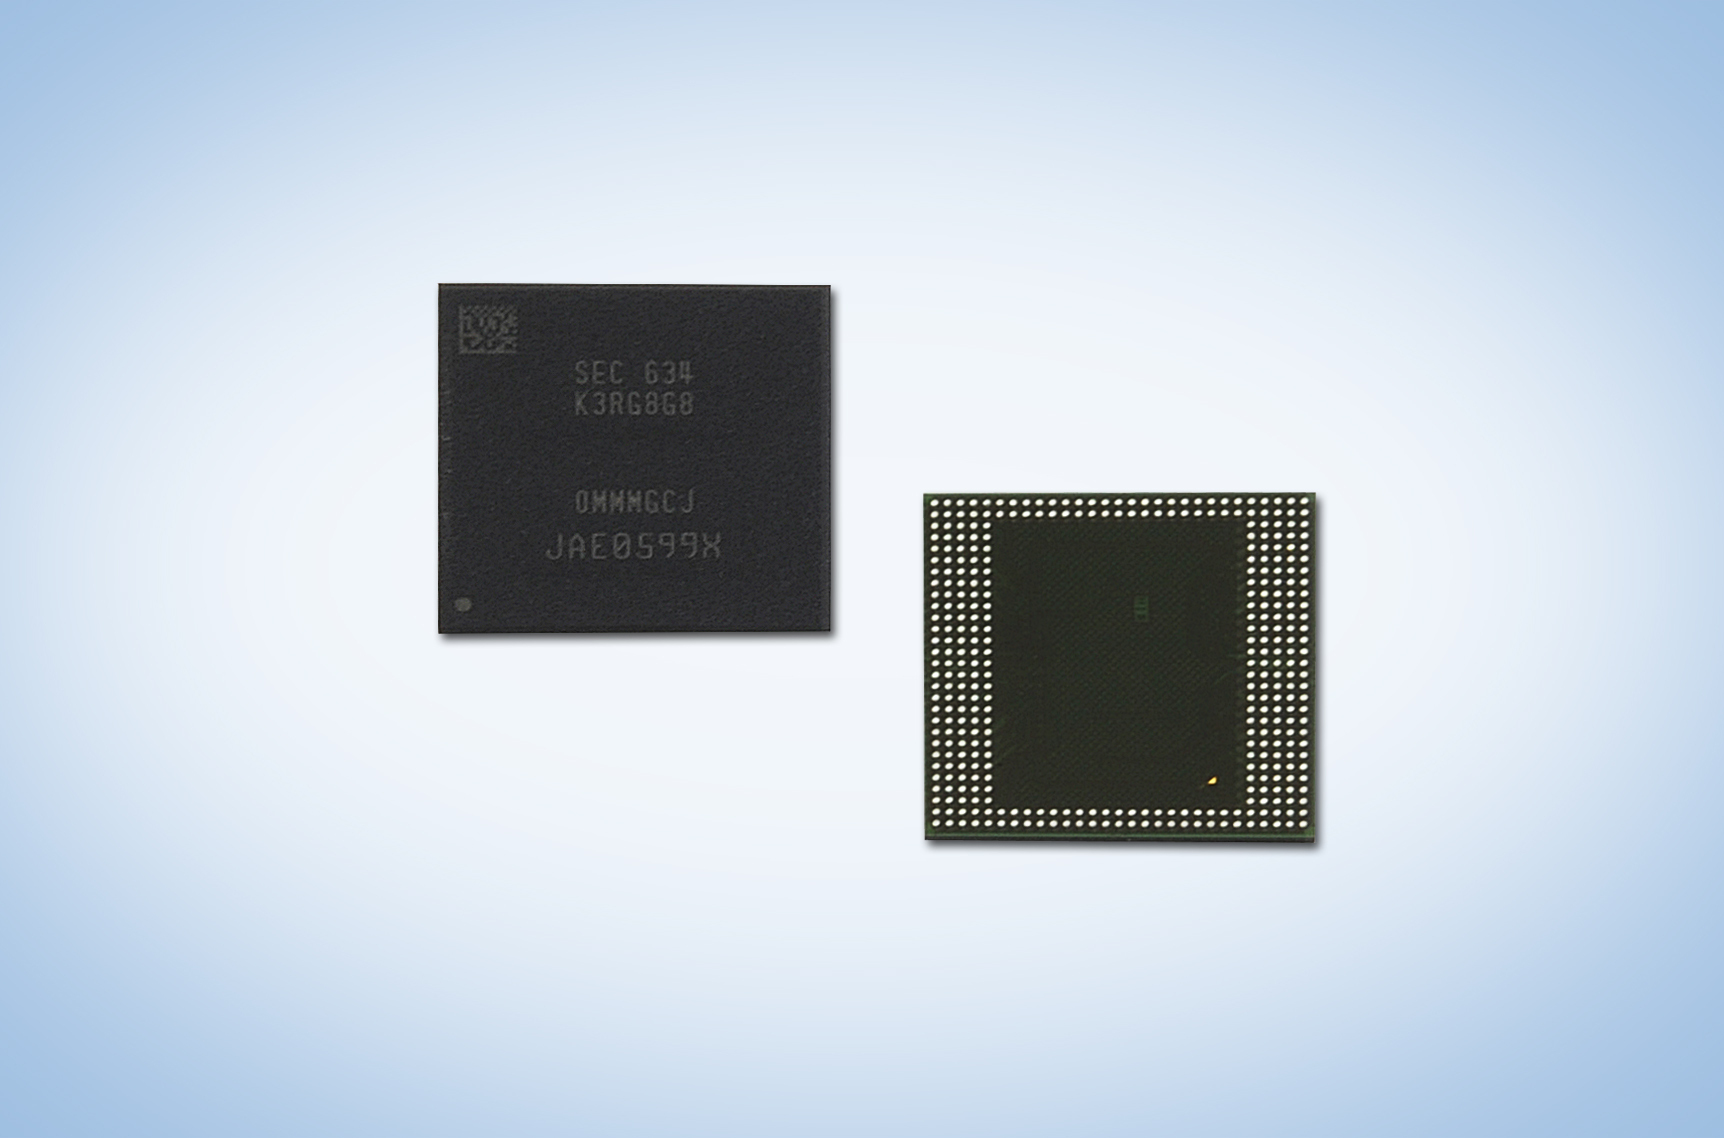 8GB LPDDR4 Samsung